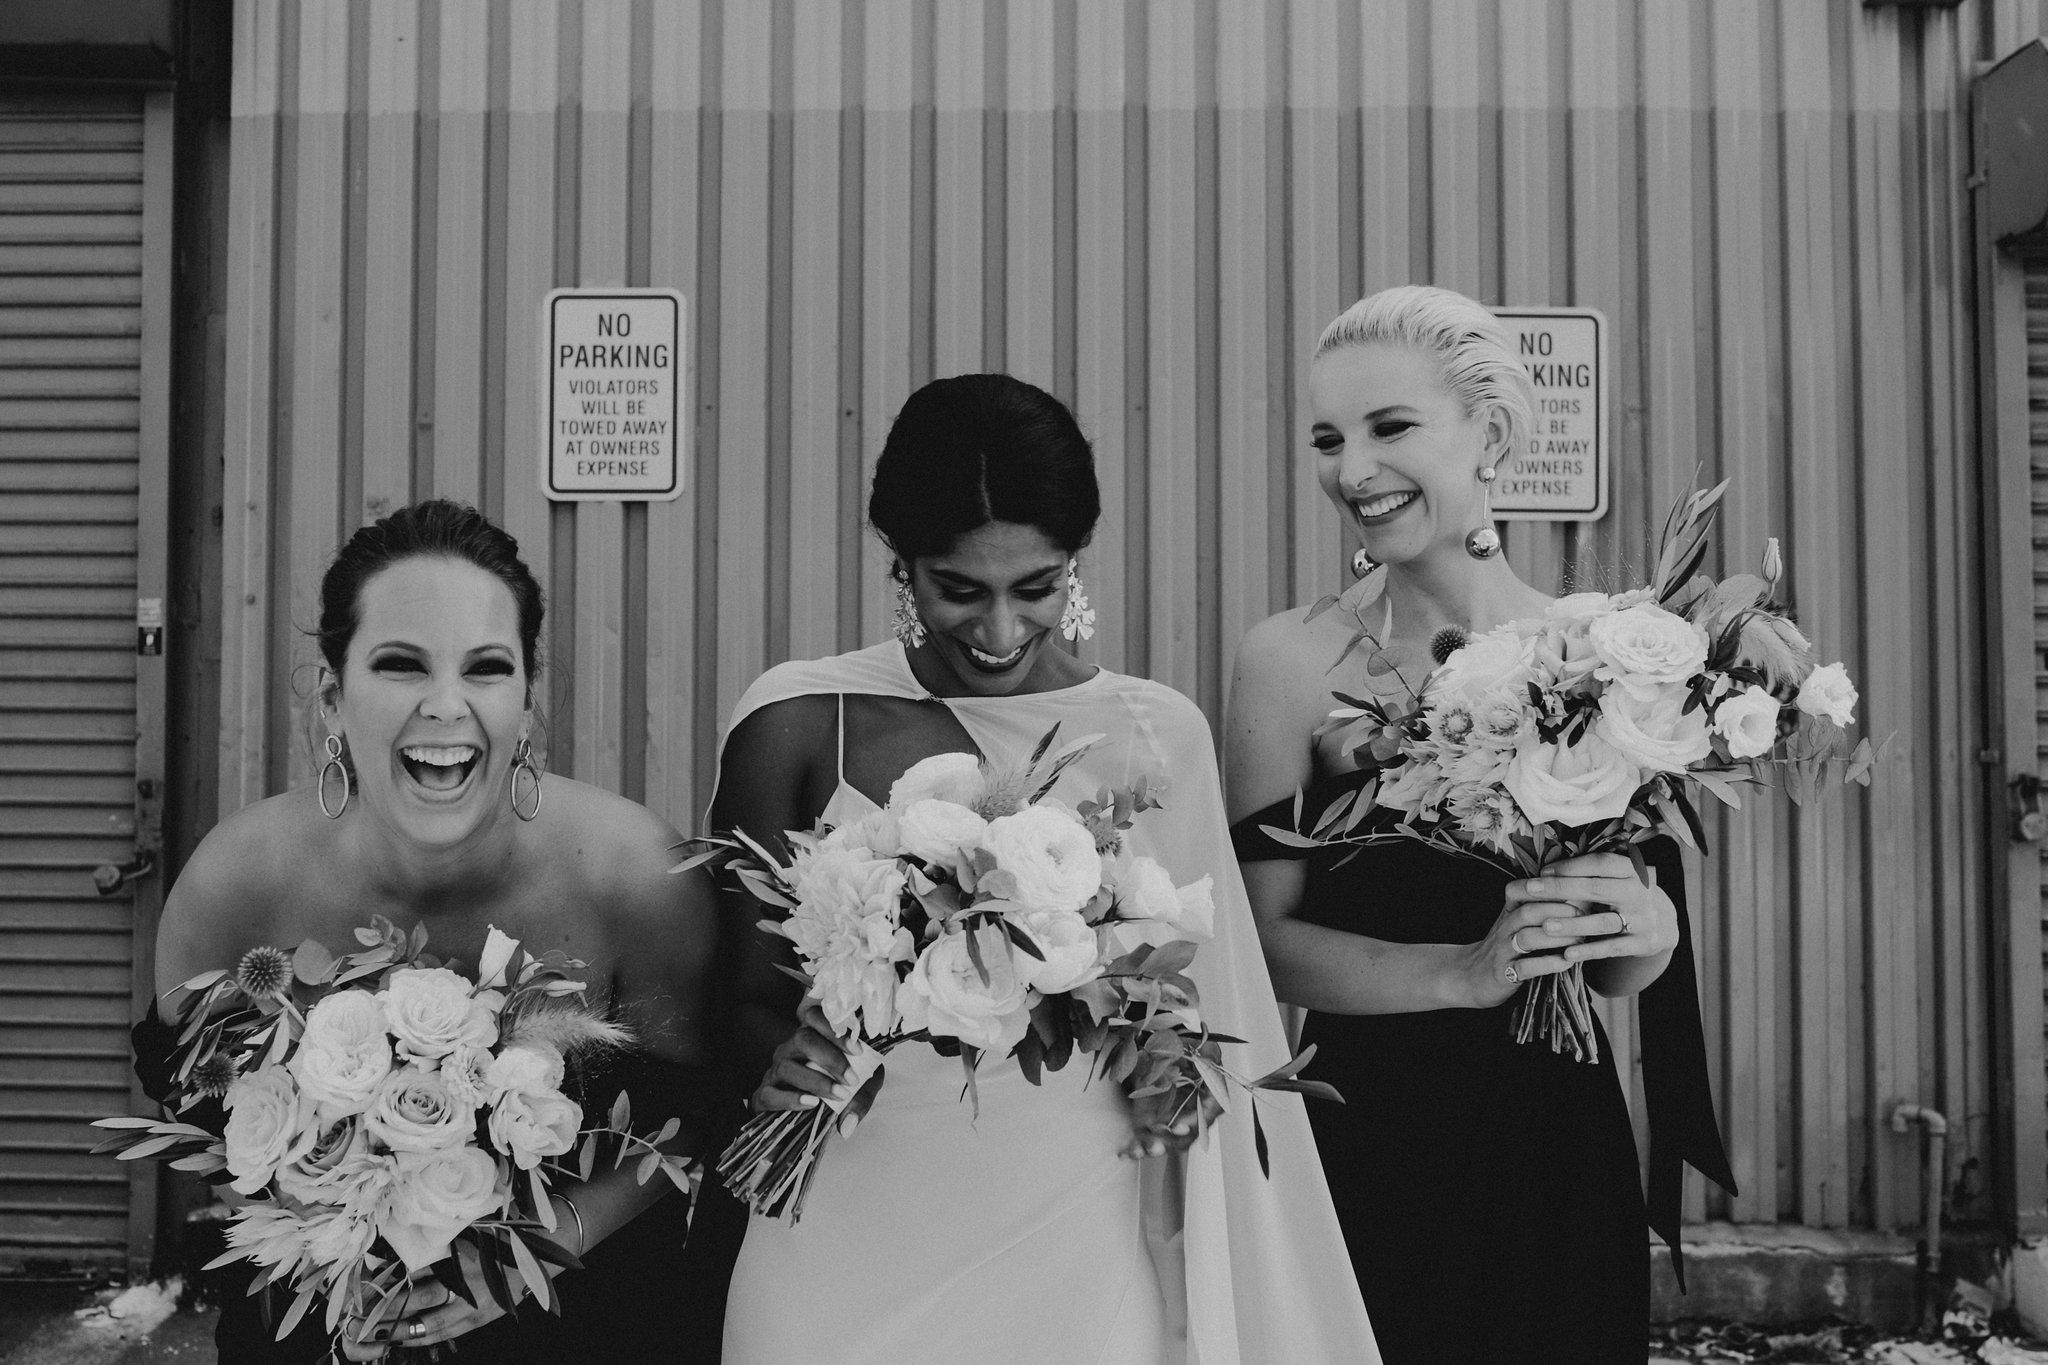 MY_MOON_WILLIAMSBURG_WEDDING-366.jpg